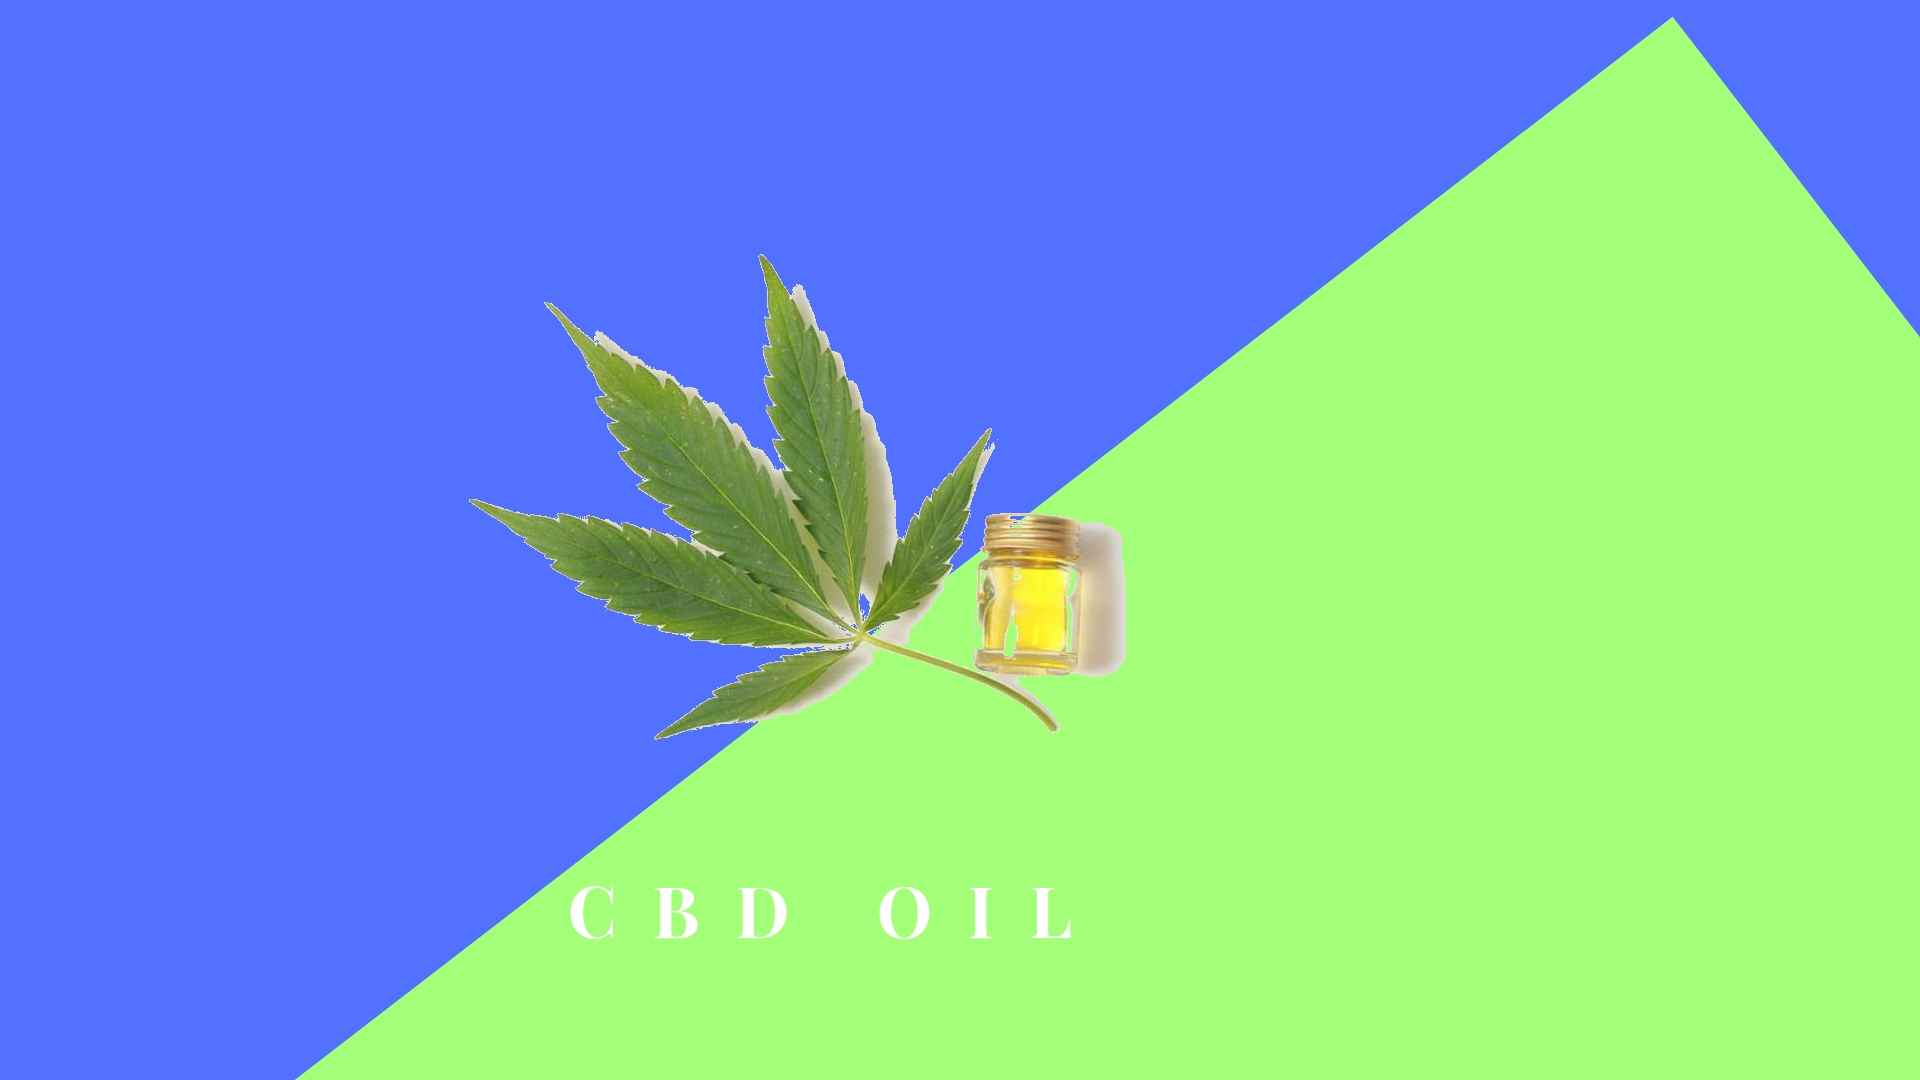 cbd oil the edit.jpg